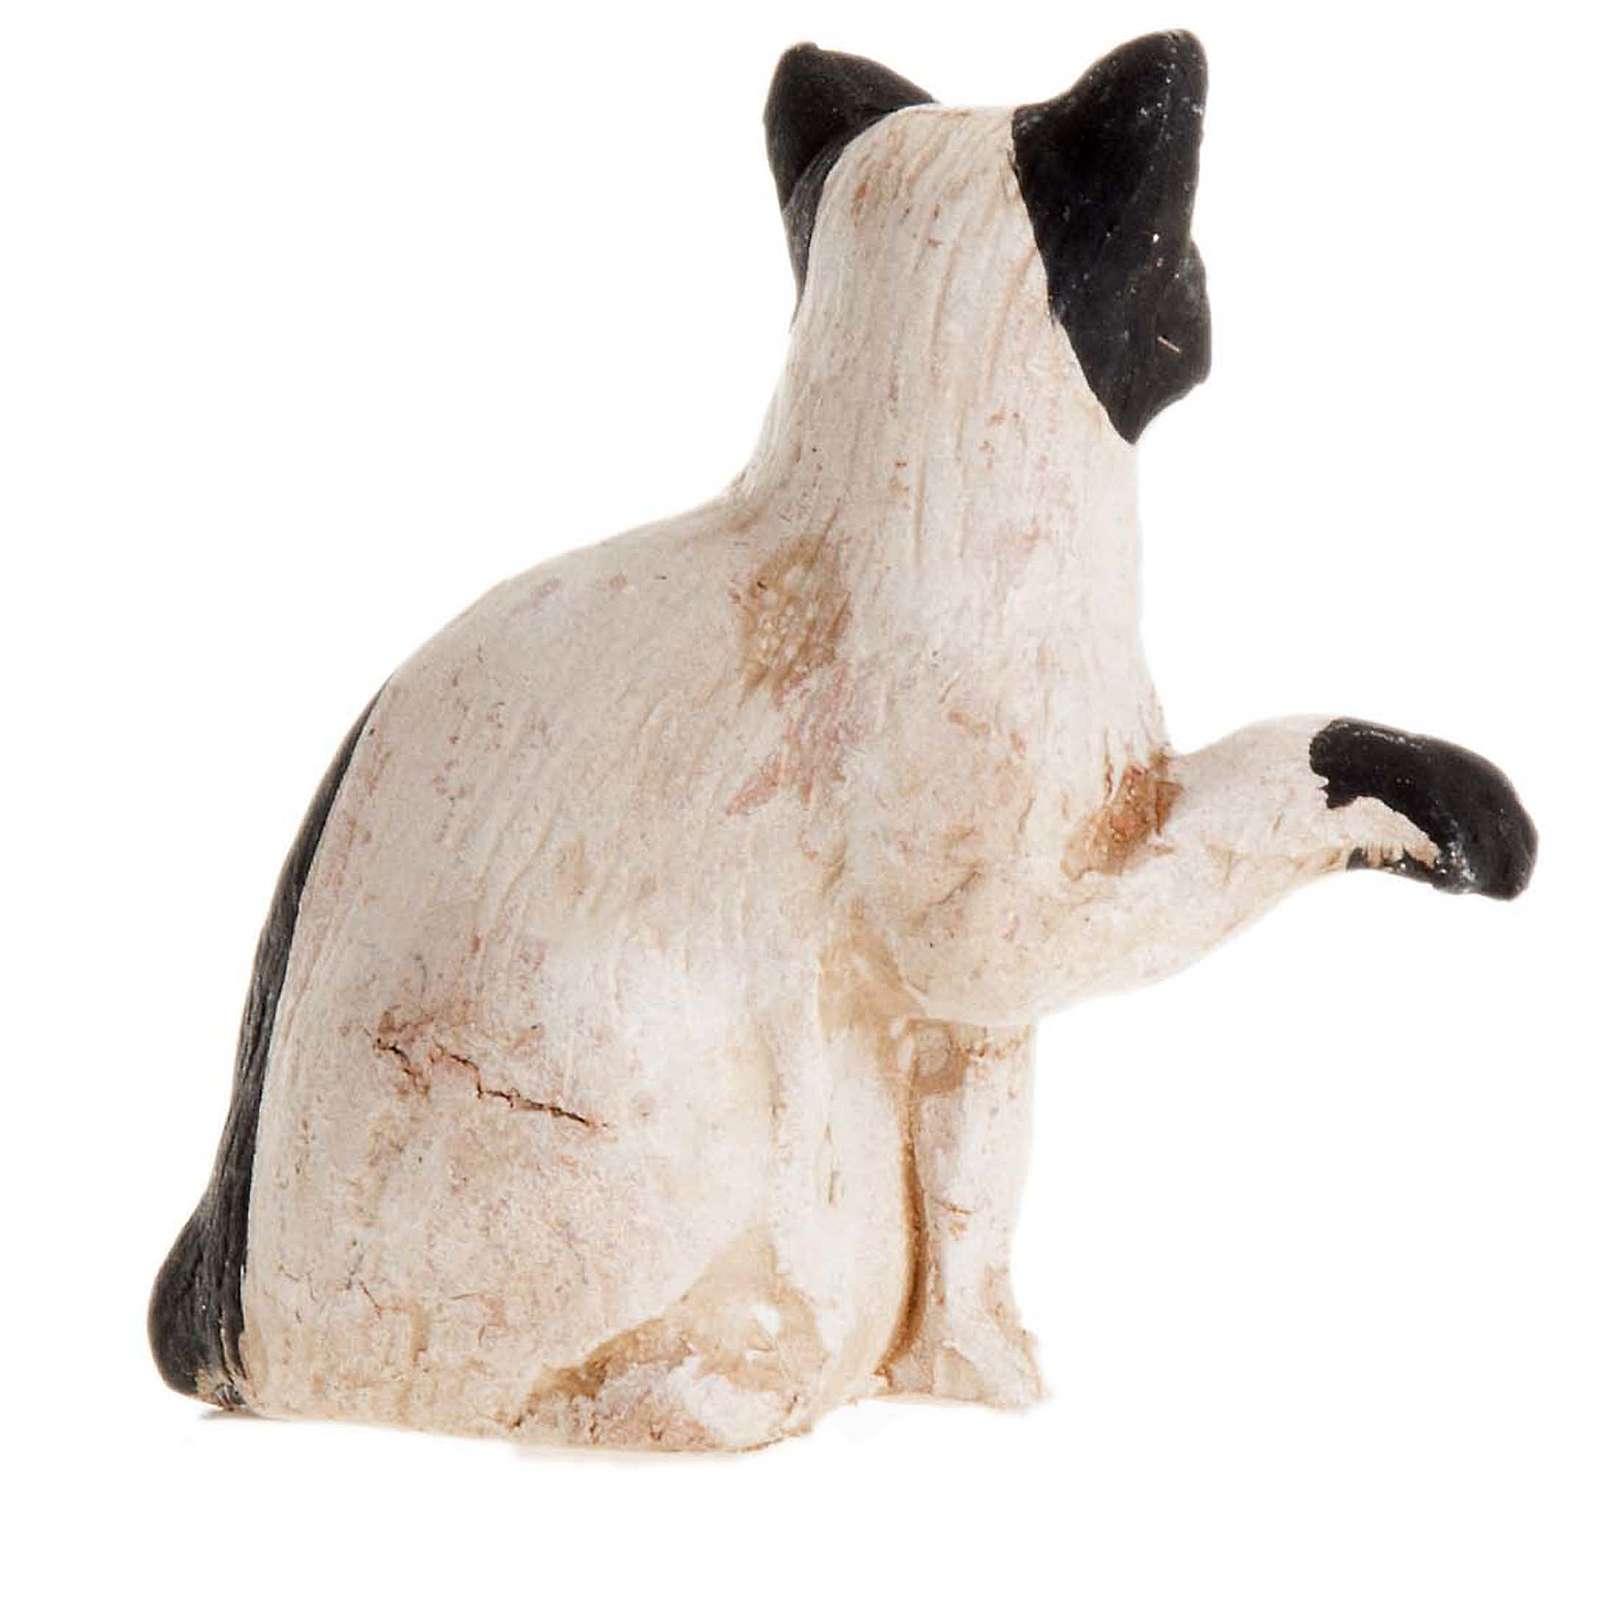 Neapolitan Nativity figurine, Black and white cat 14cm 4